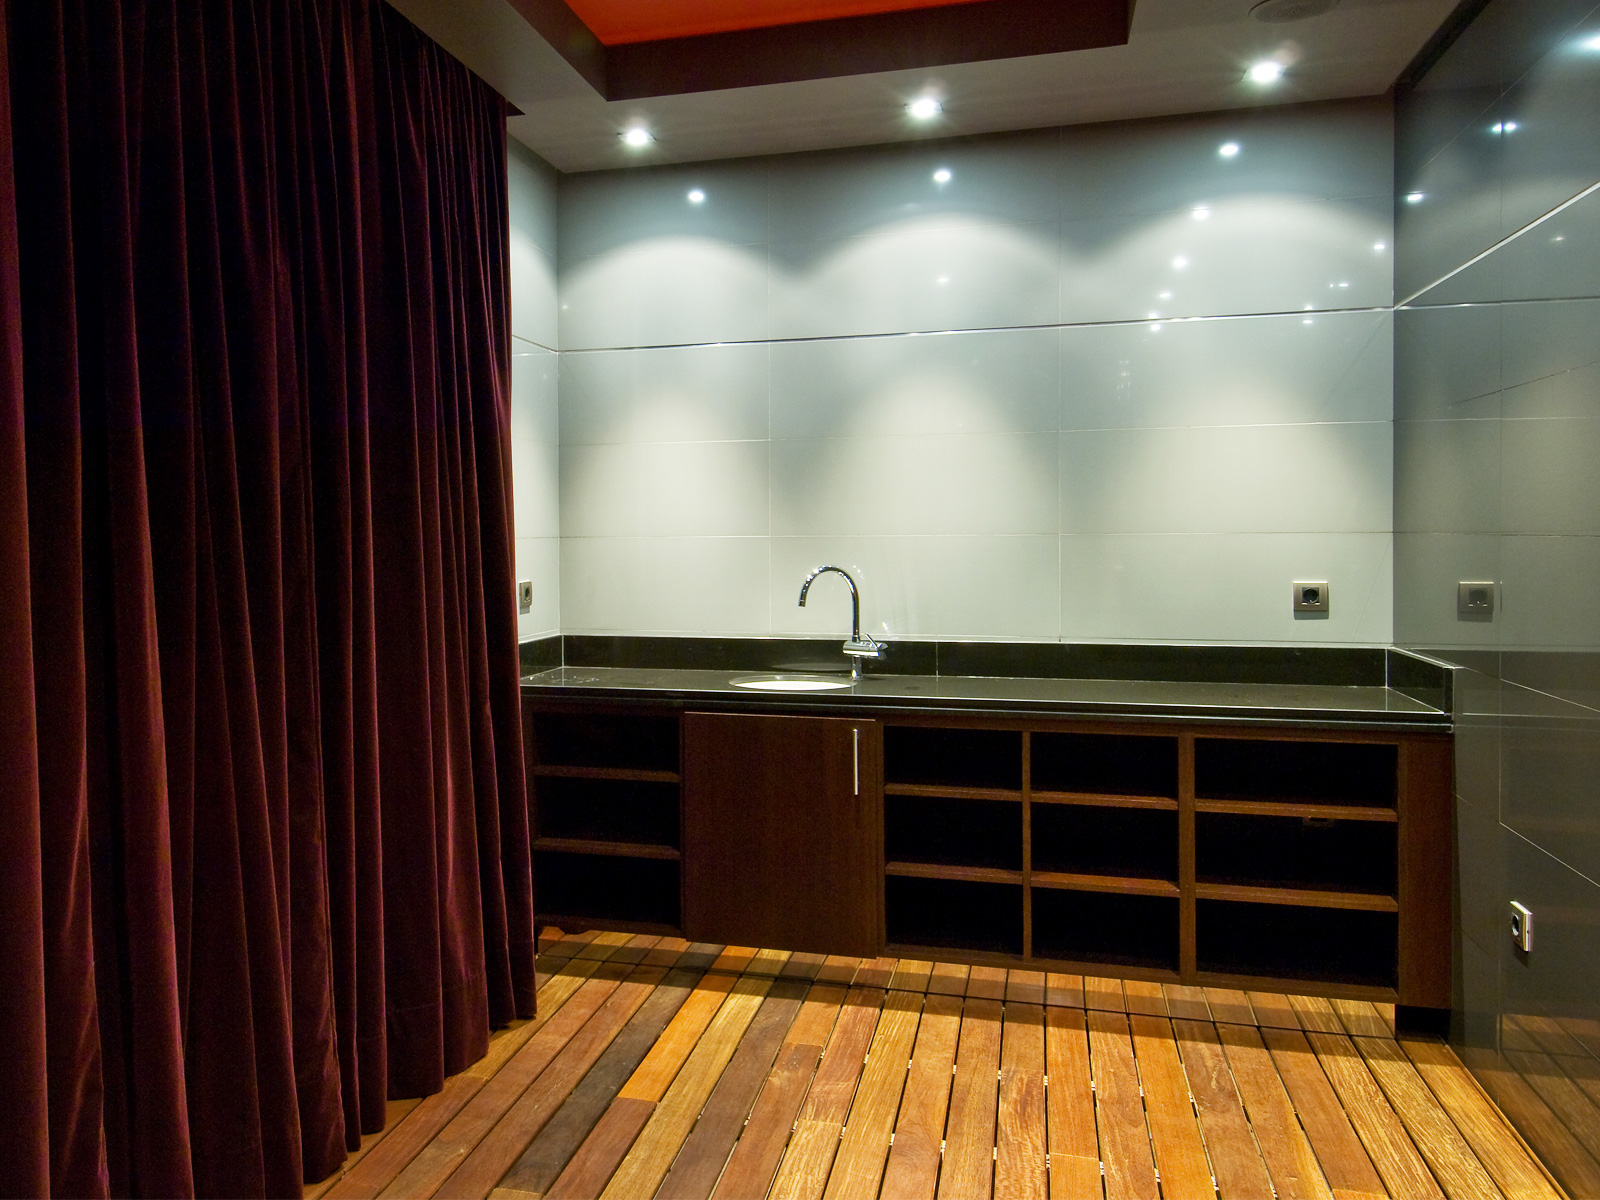 Indoor-Vincci Frontaura 4*